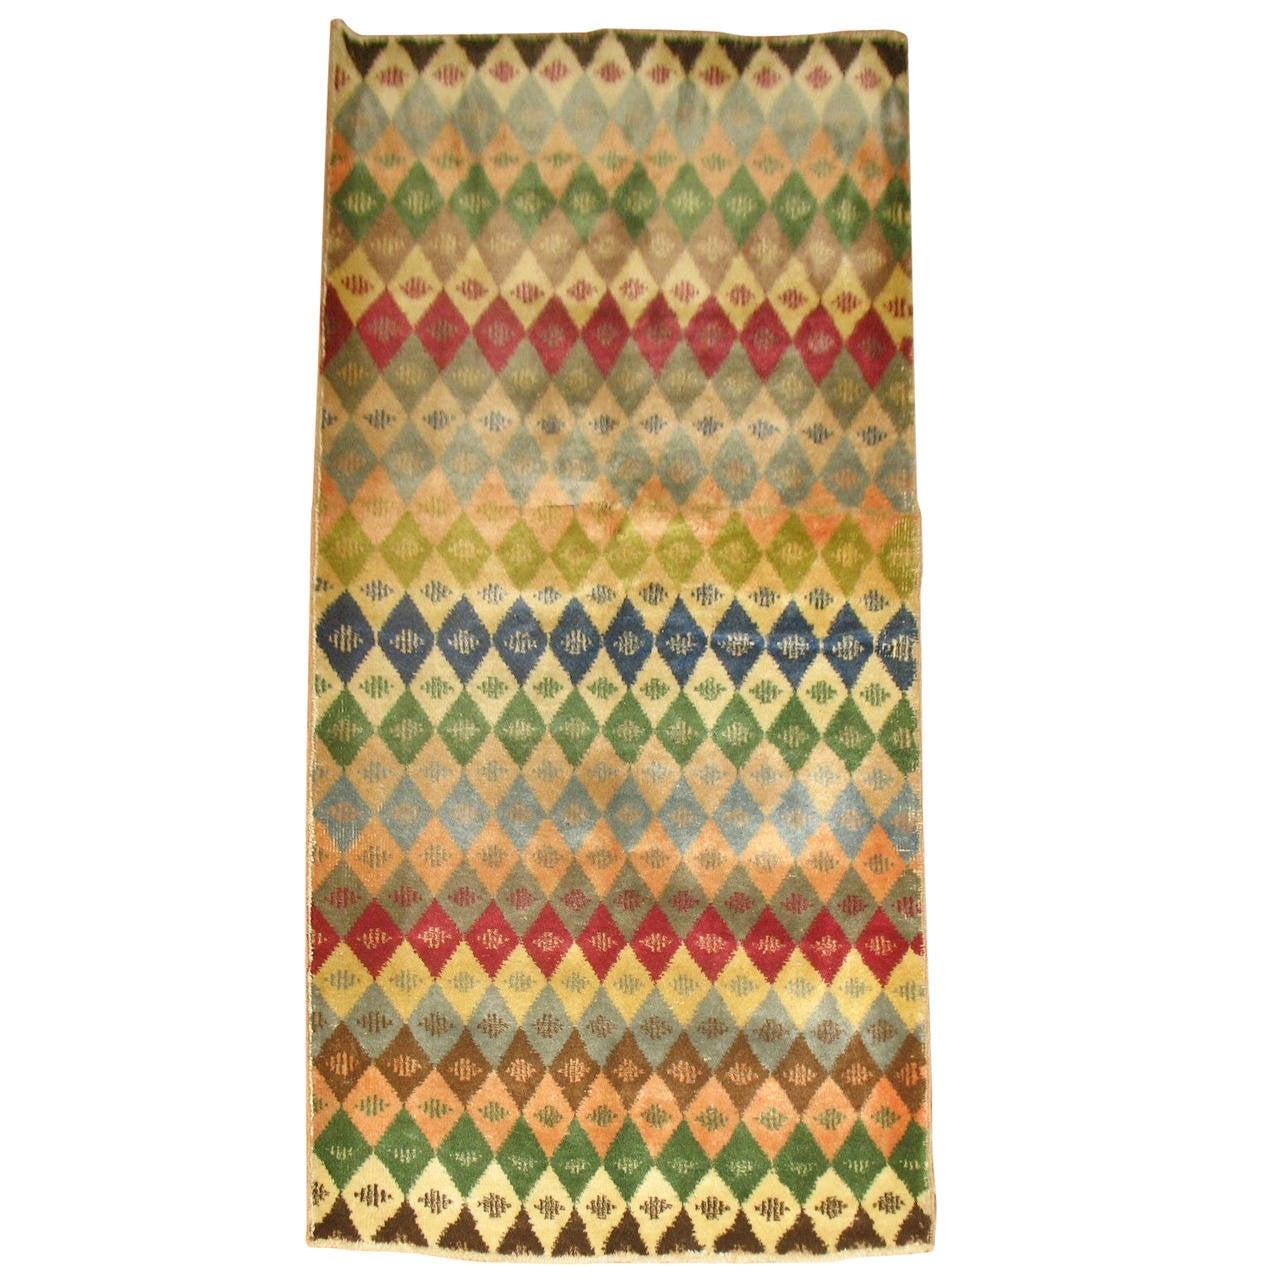 Vintage Turkish Geometric Anatolian Rug For Sale At 1stdibs